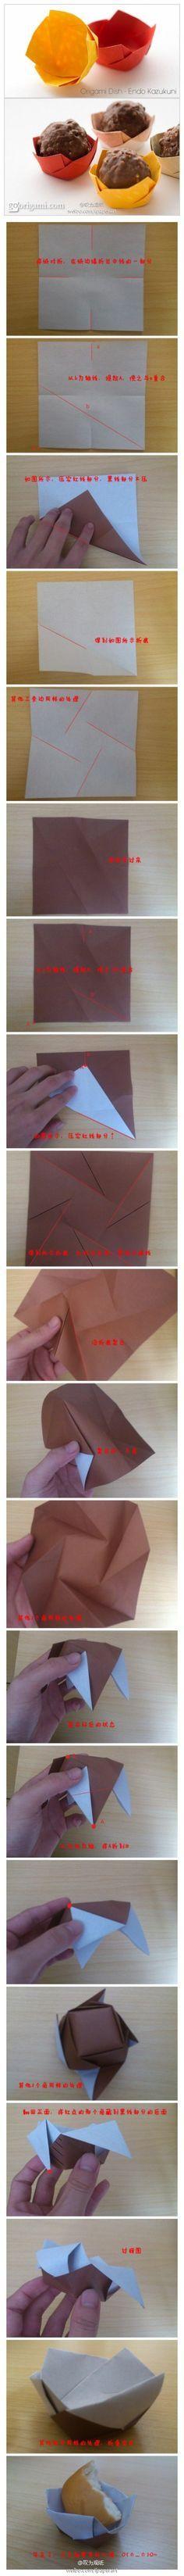 Tiny origami bowl.  Diagrams.